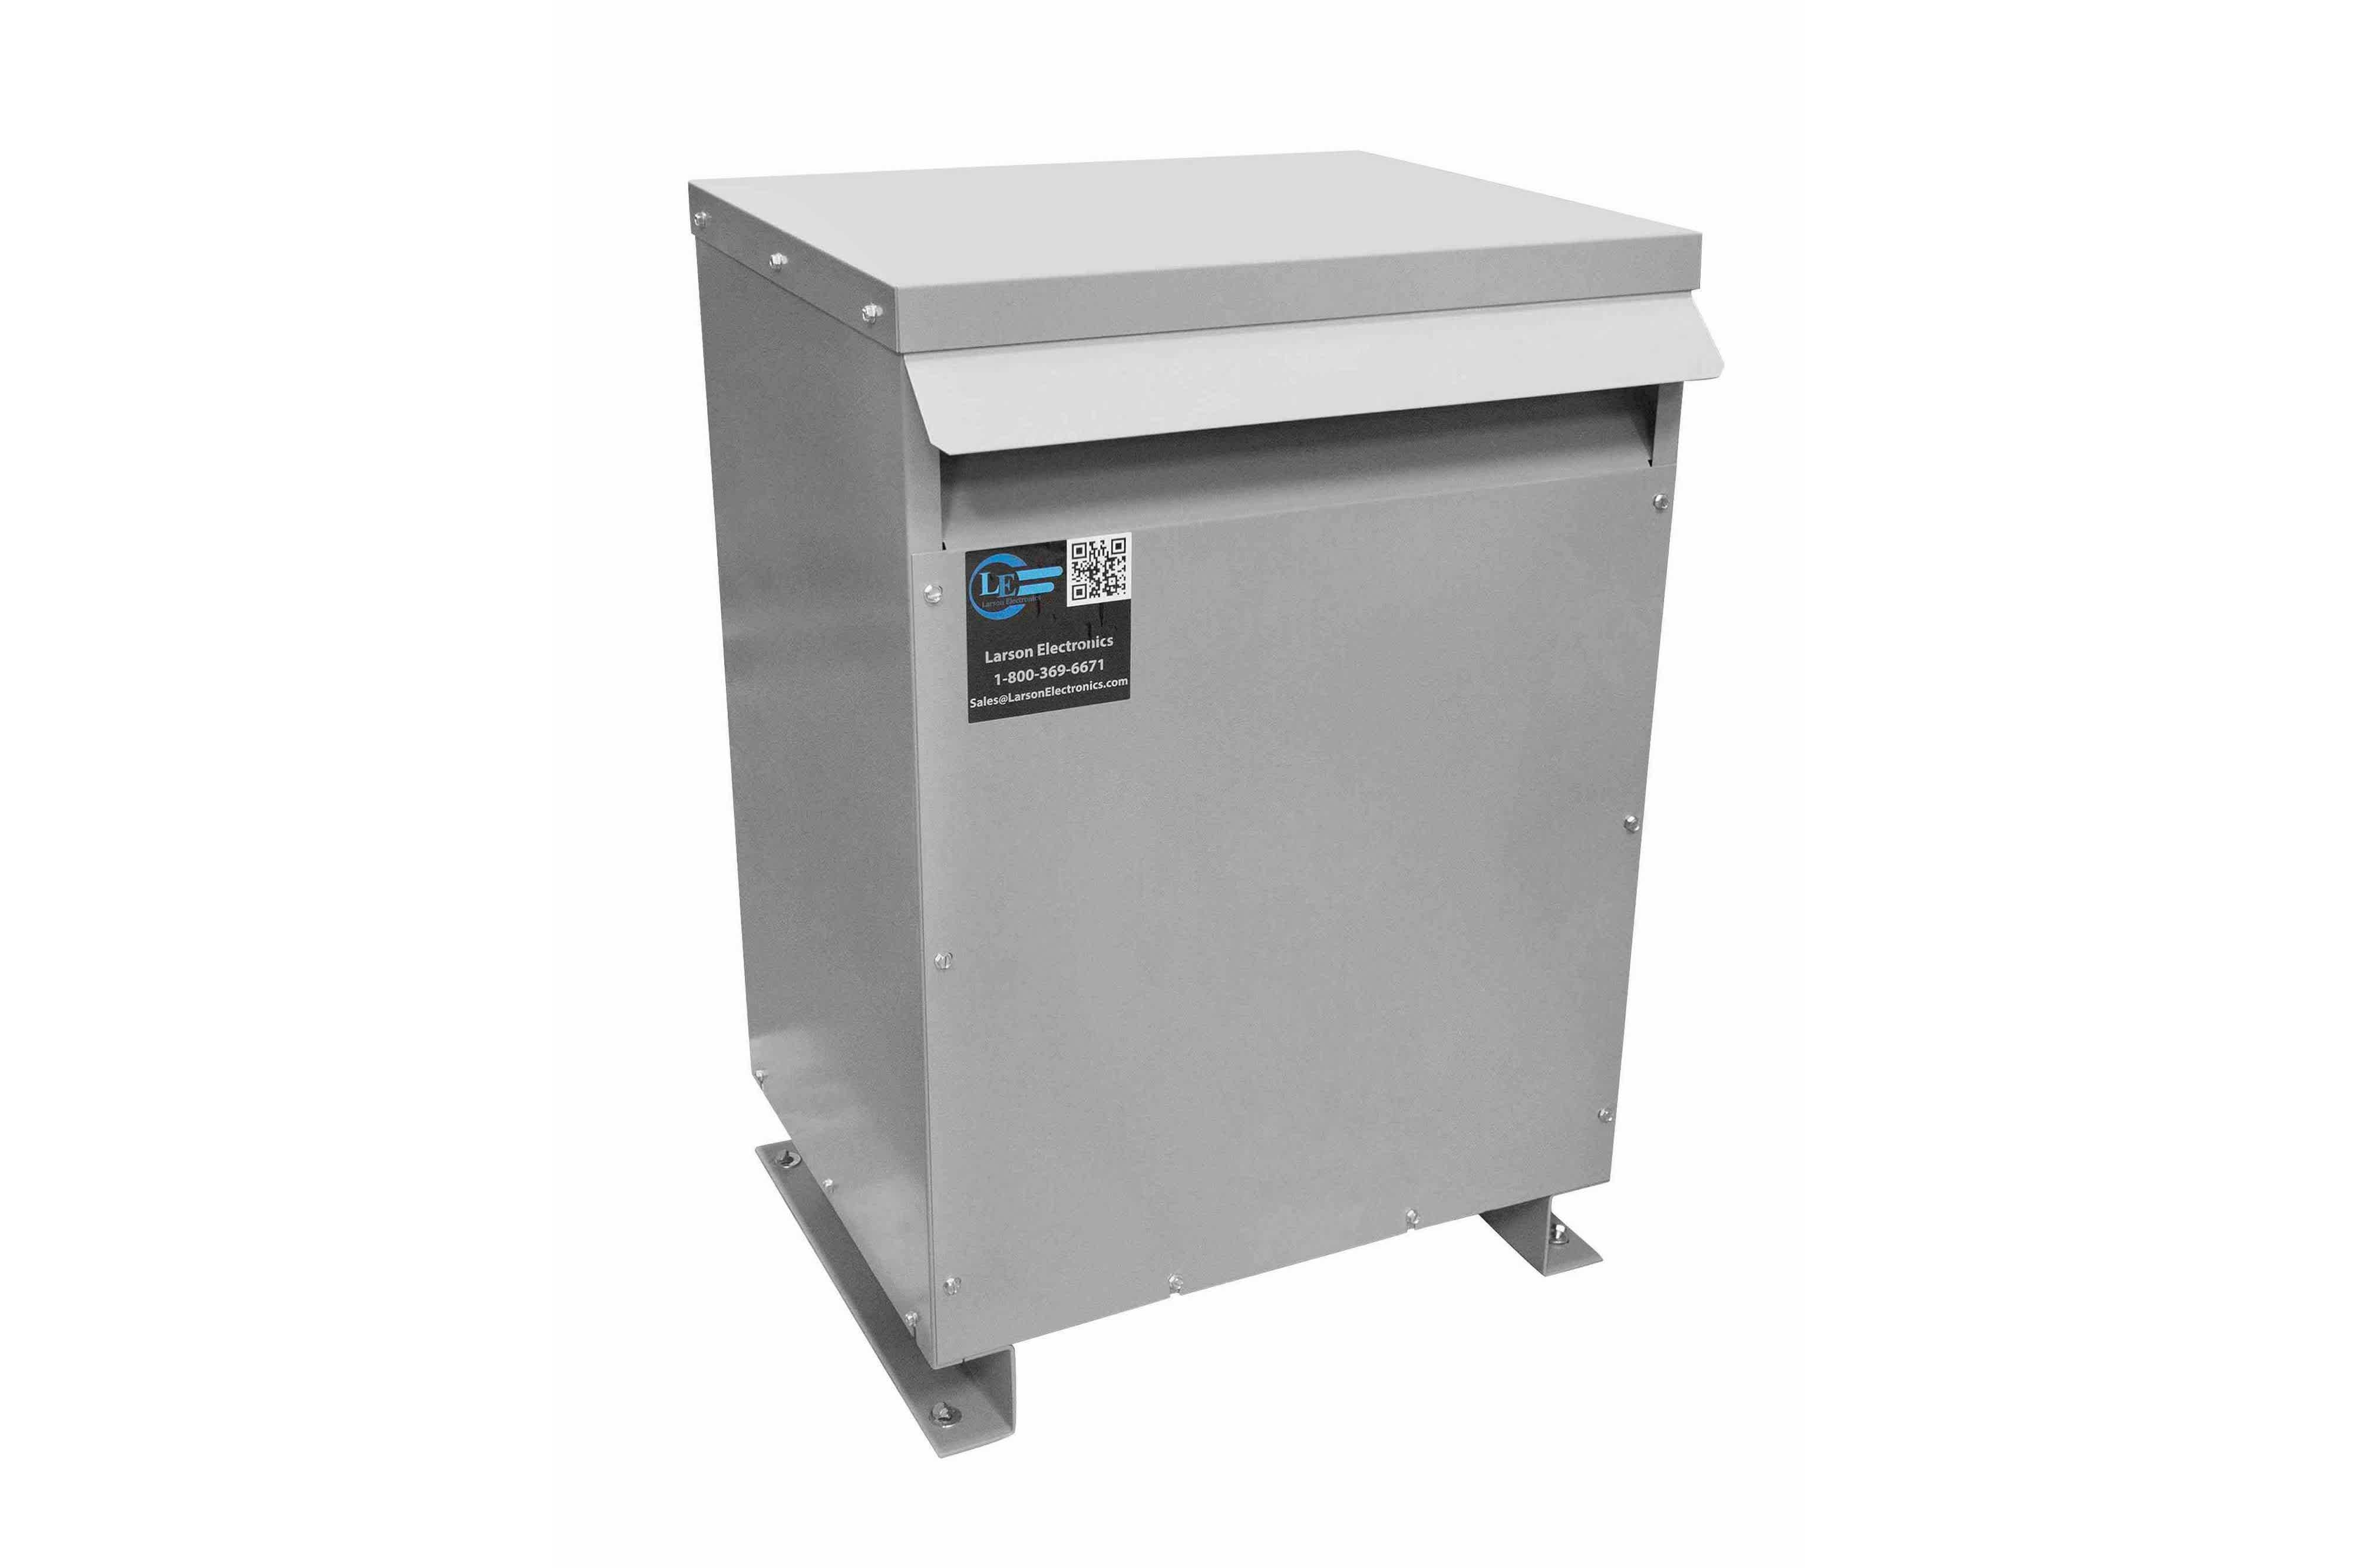 42.5 kVA 3PH Isolation Transformer, 415V Wye Primary, 600Y/347 Wye-N Secondary, N3R, Ventilated, 60 Hz